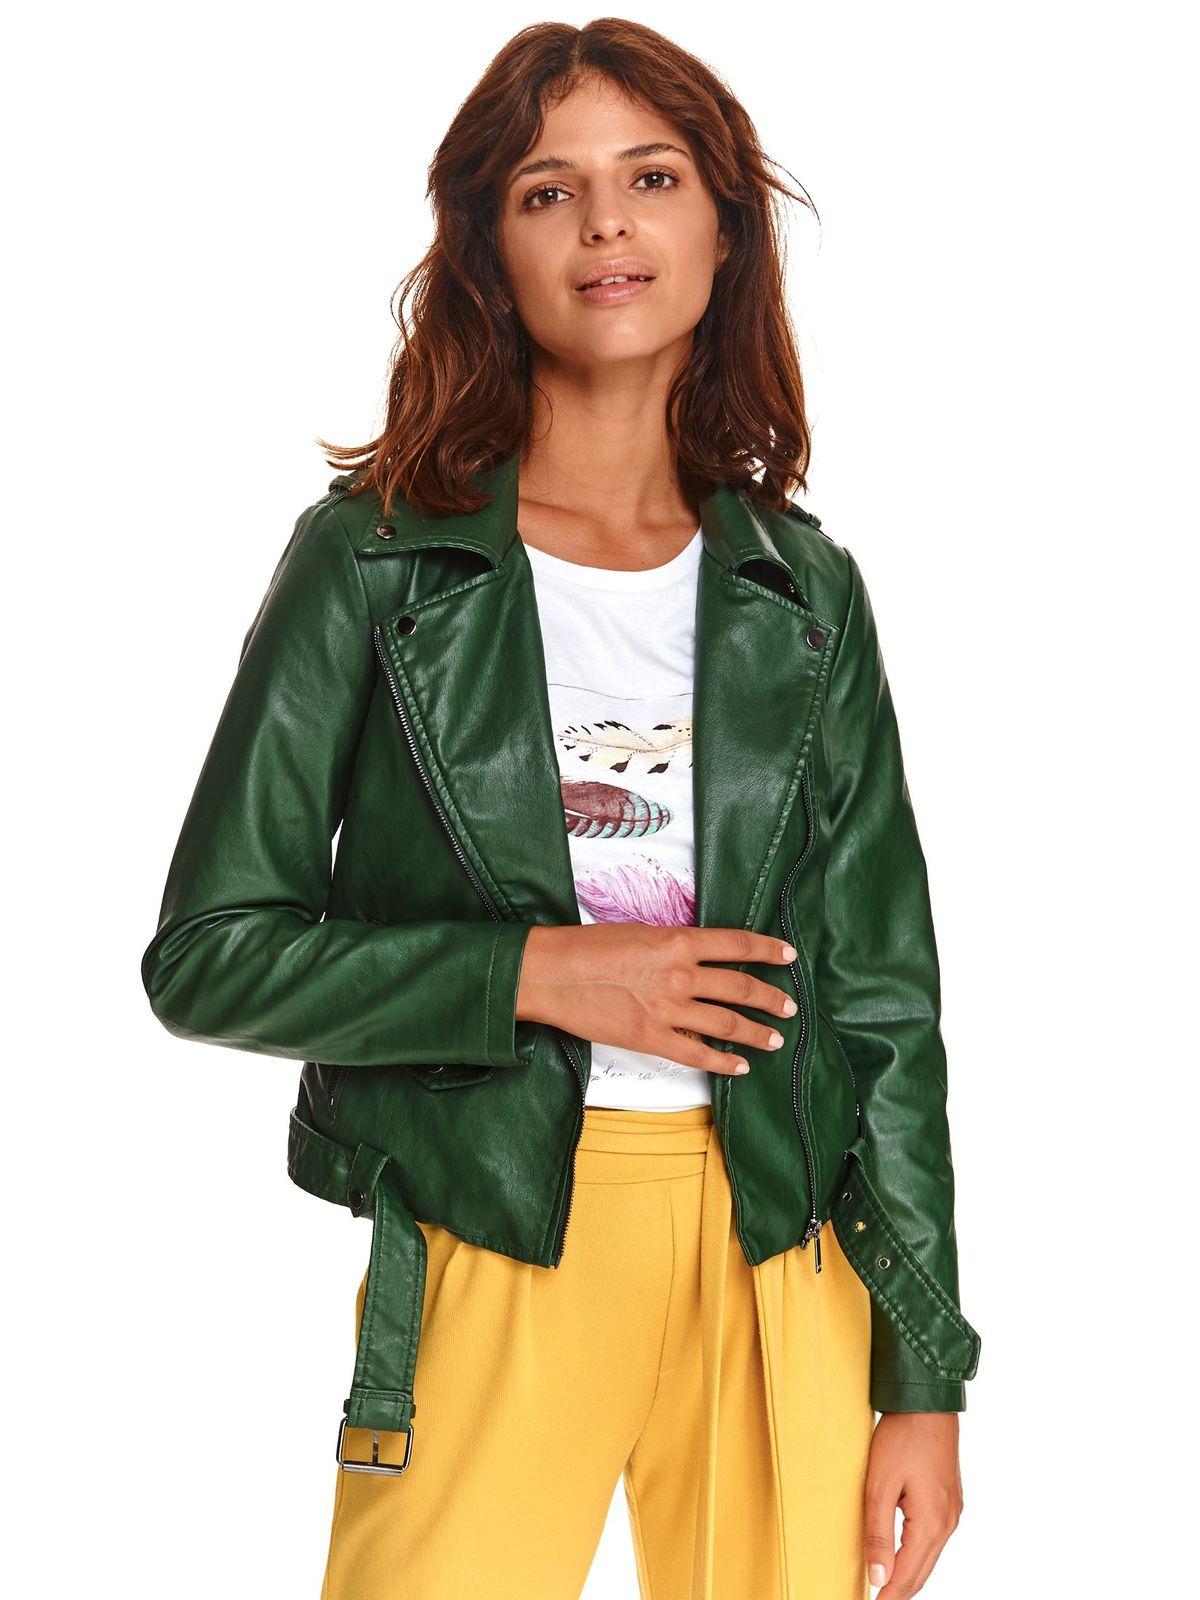 Geaca Top Secret verde scurta cambrata din piele ecologica elastica accesorizata cu cordon